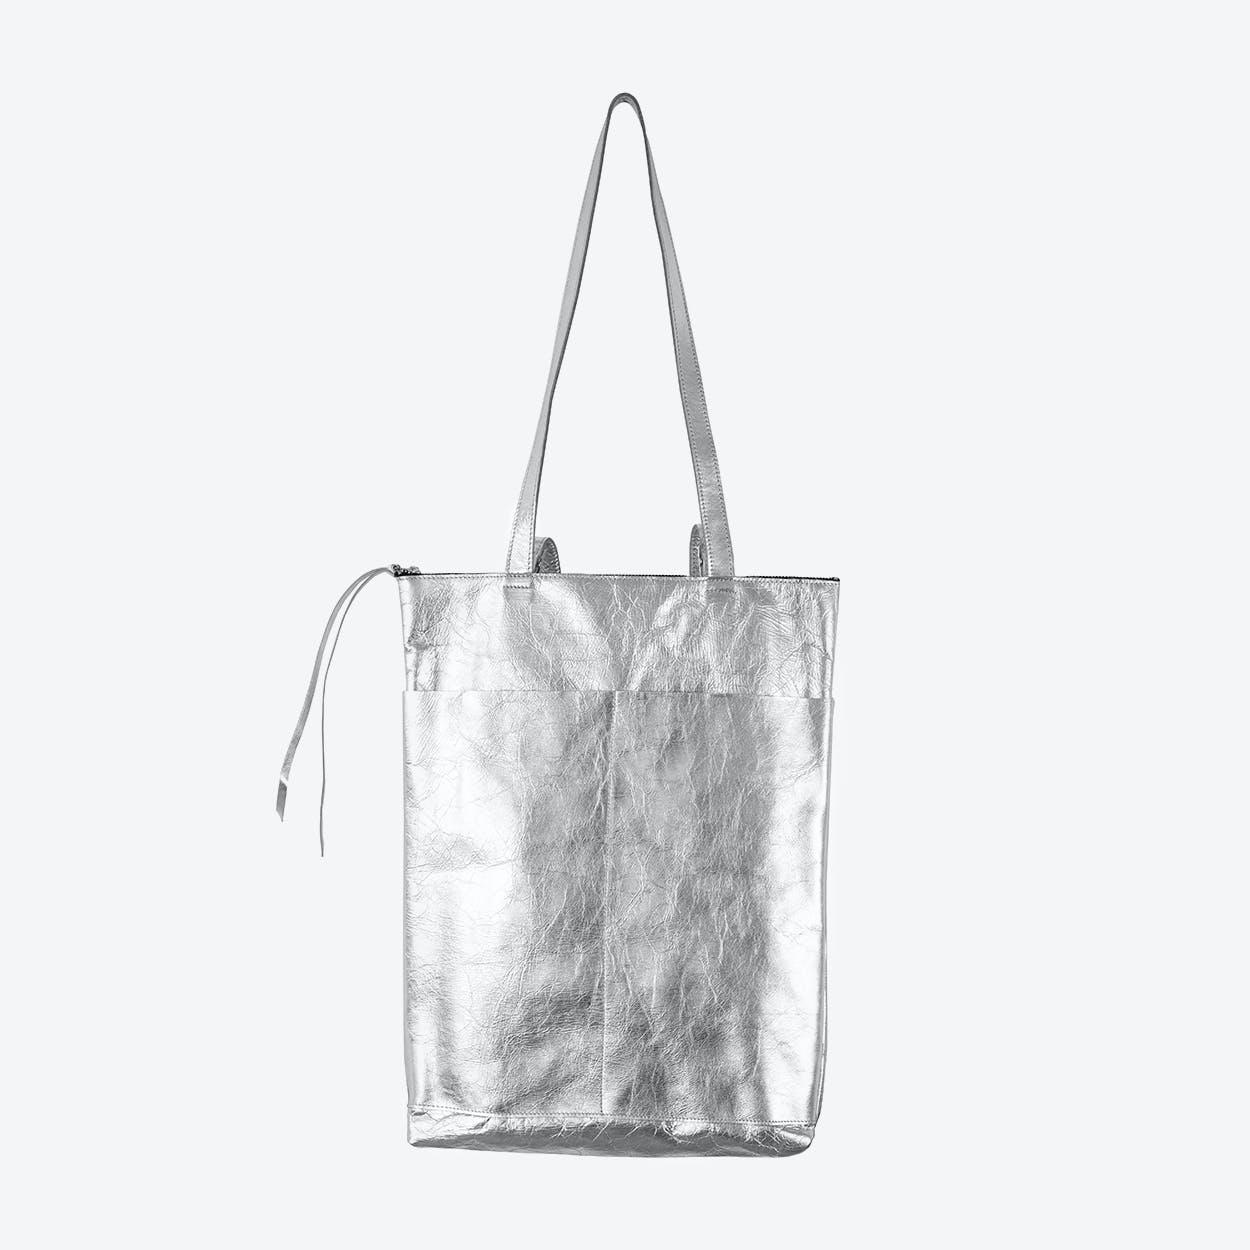 BJARNE Backpack in Silver